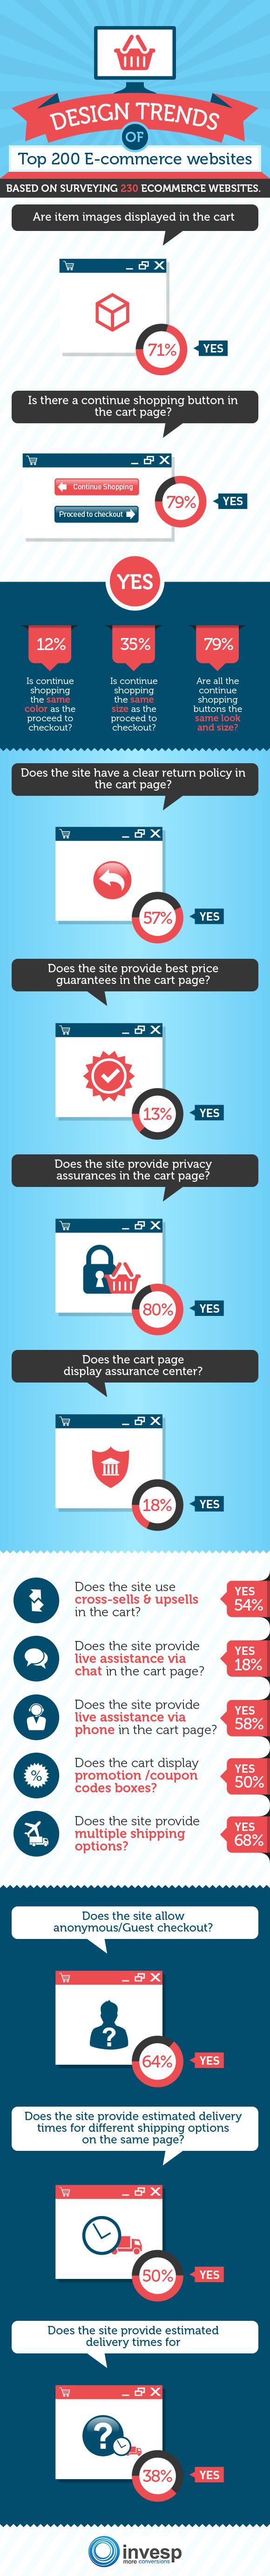 Design Trends of Top 200 E-commerce Websites